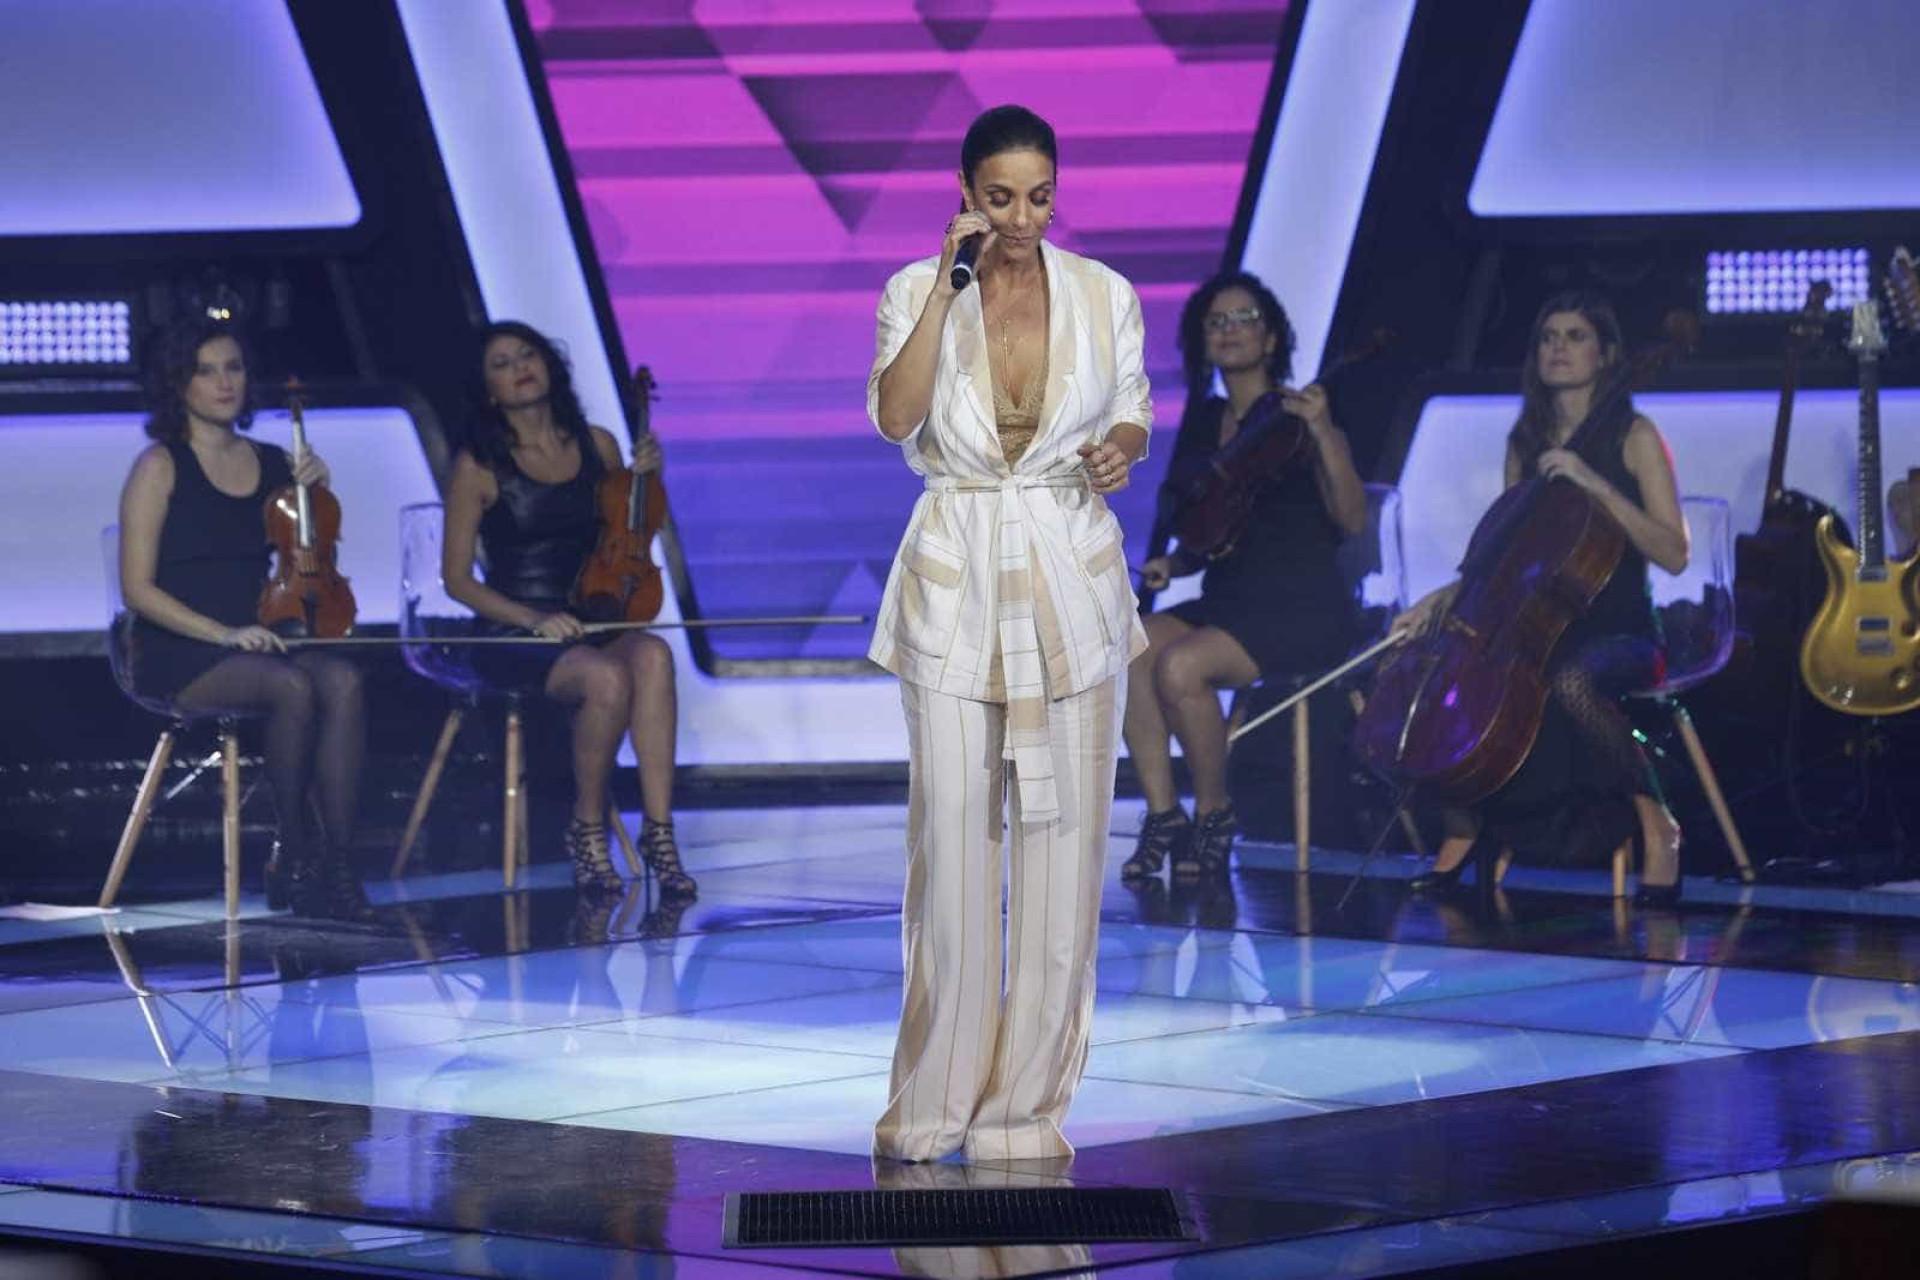 Ivete Sangalo anuncia gravidez de gêmeos: 'Mamãe puro suingue'